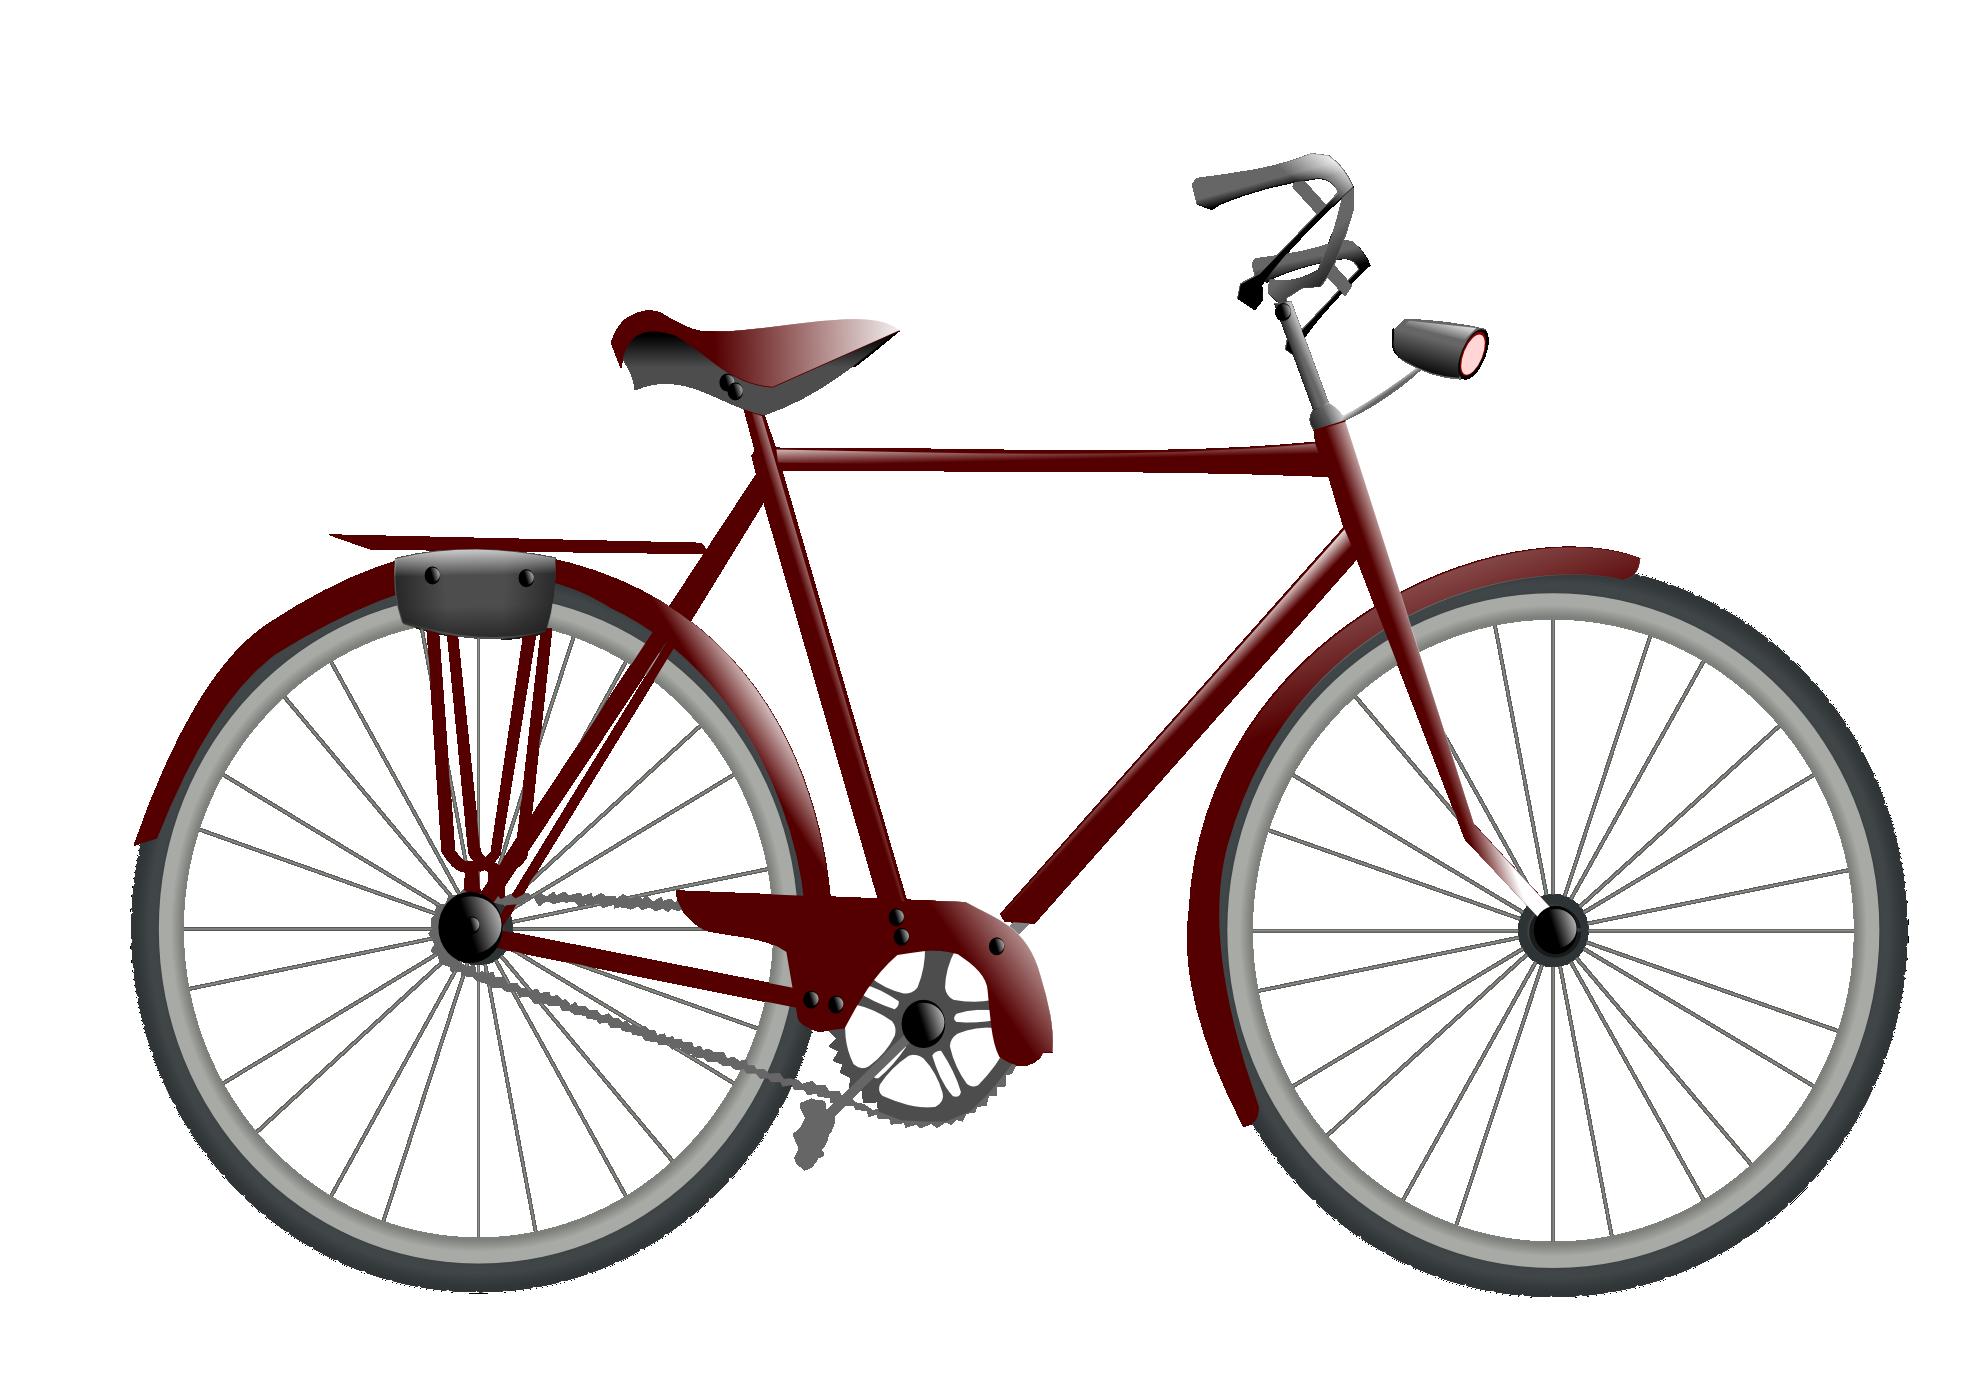 Ladybug clipart cycle. Clipartist net clip art